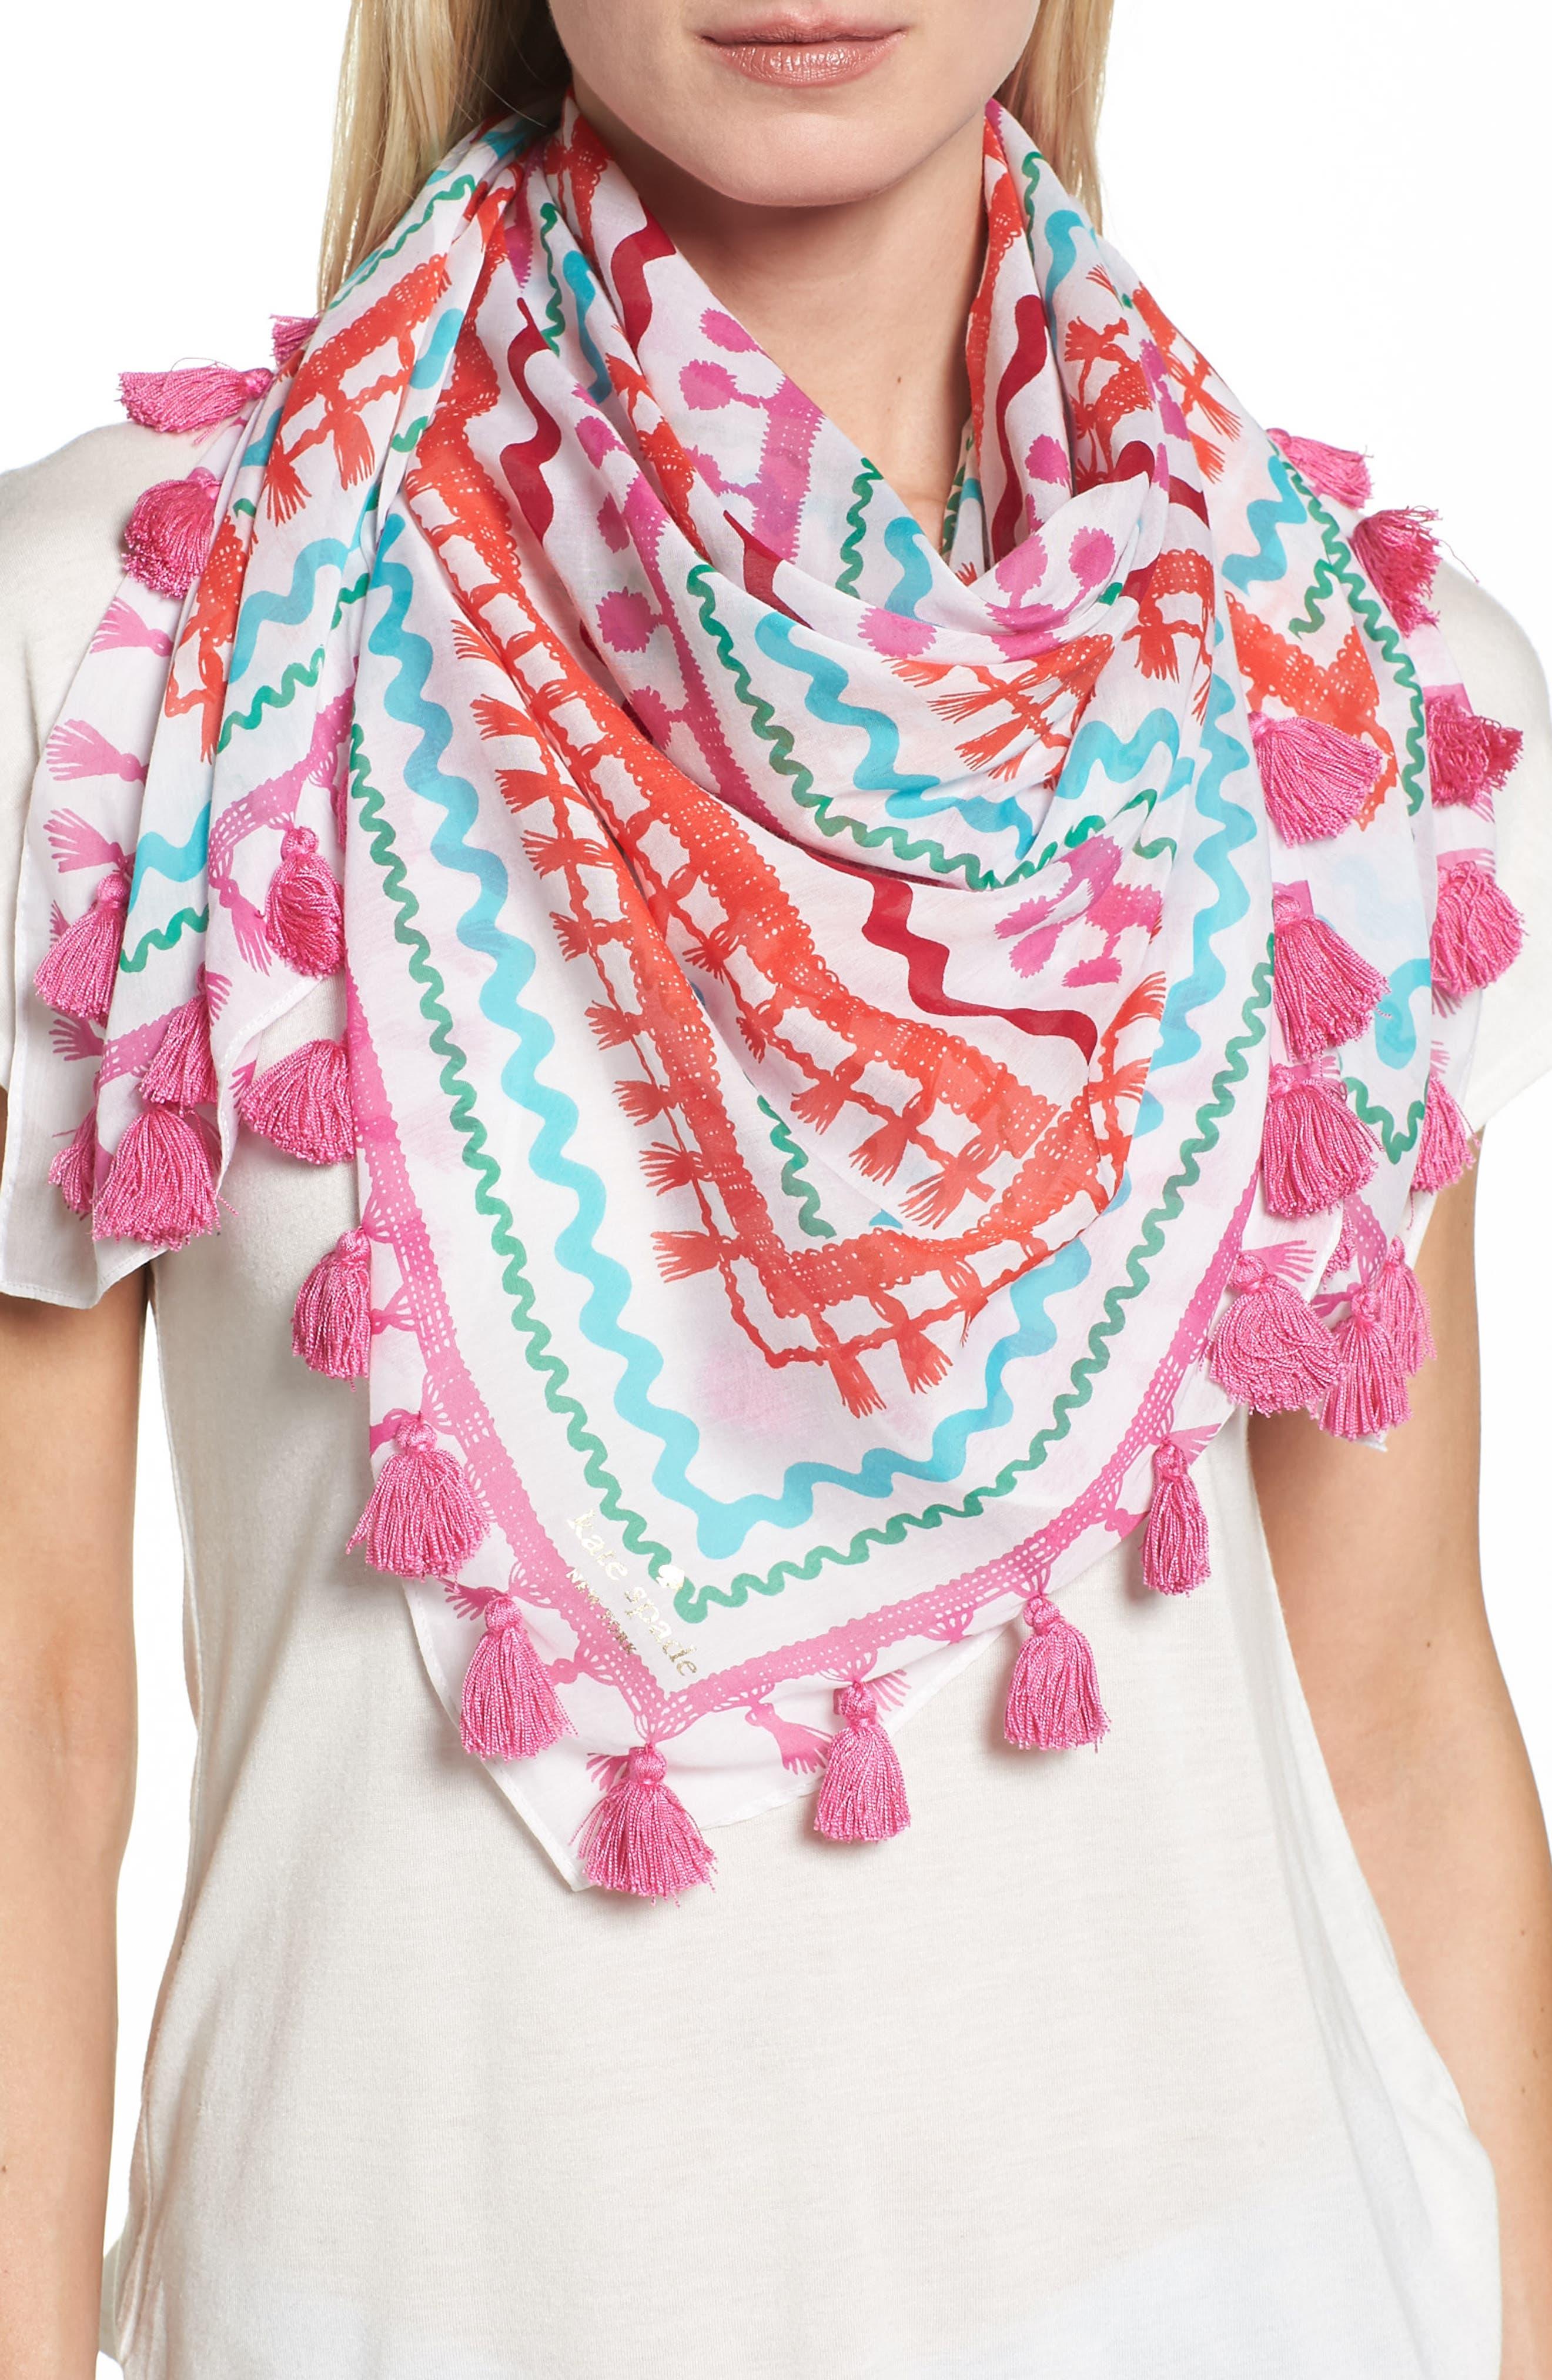 kate spade new york rickrack square scarf